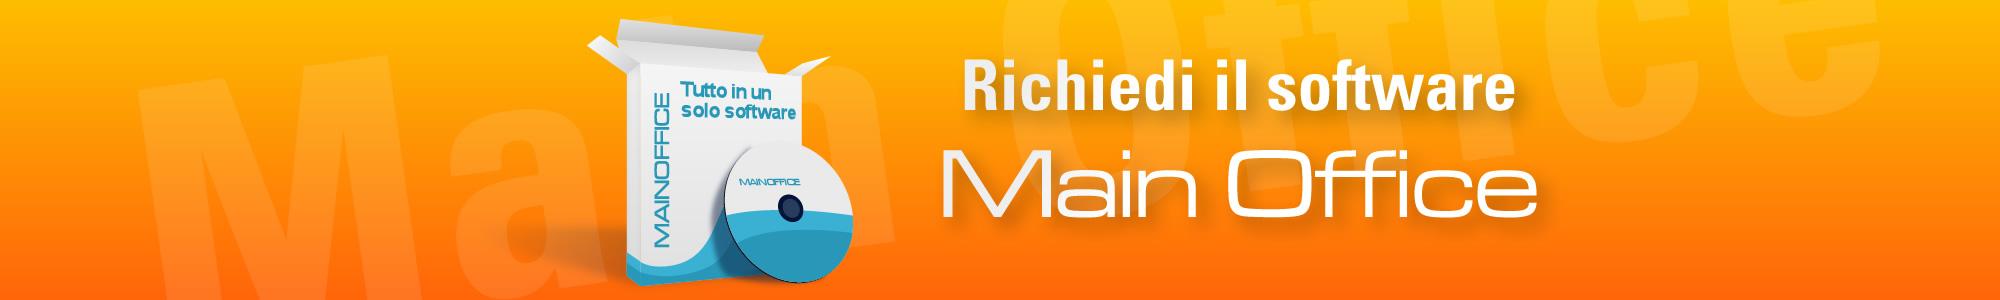 img_richiedi_software